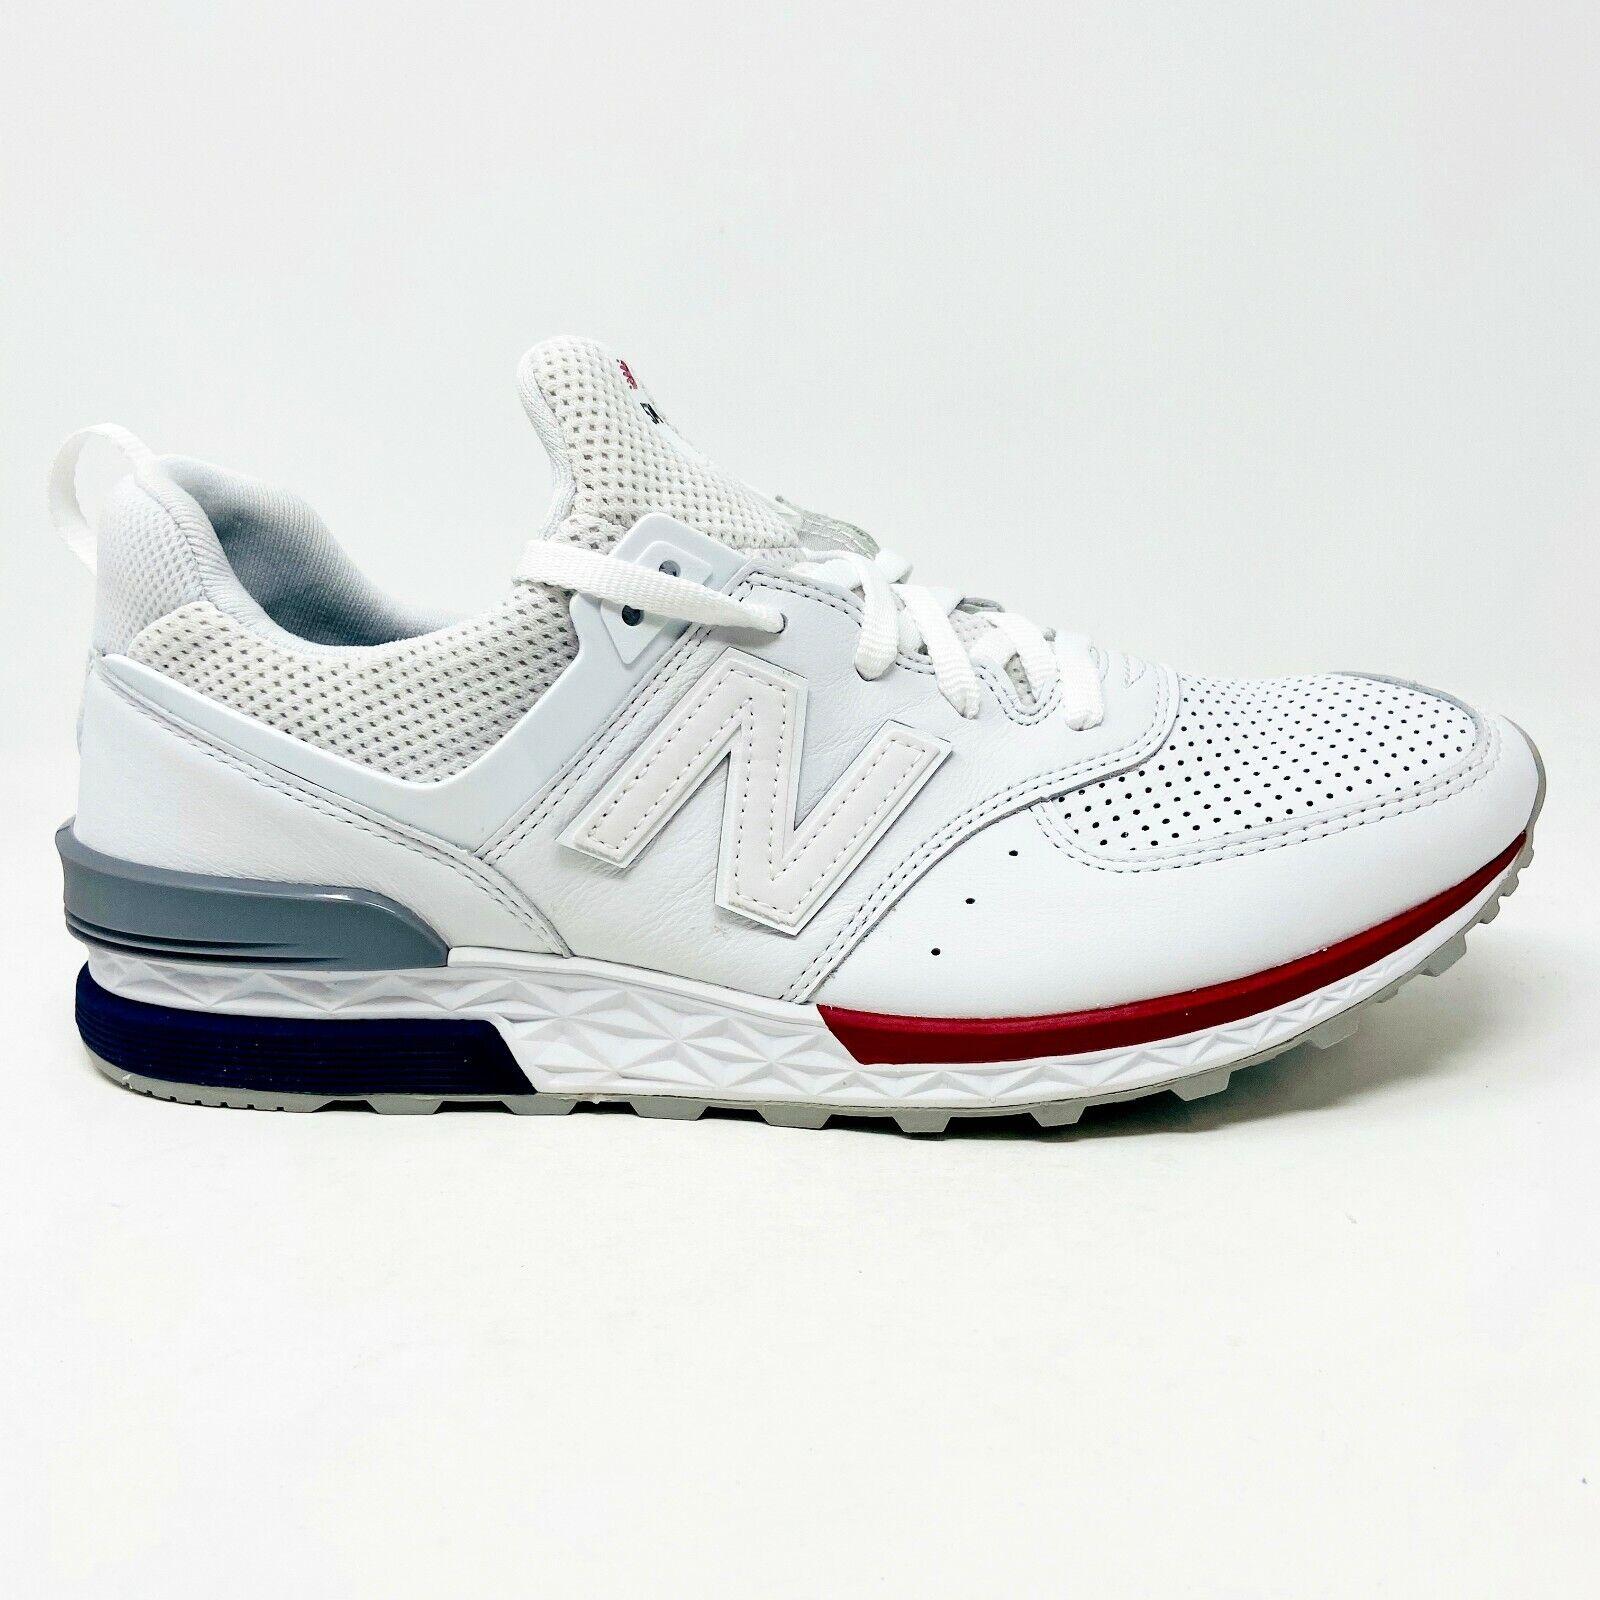 New Balance 574 Sport White Red Mens